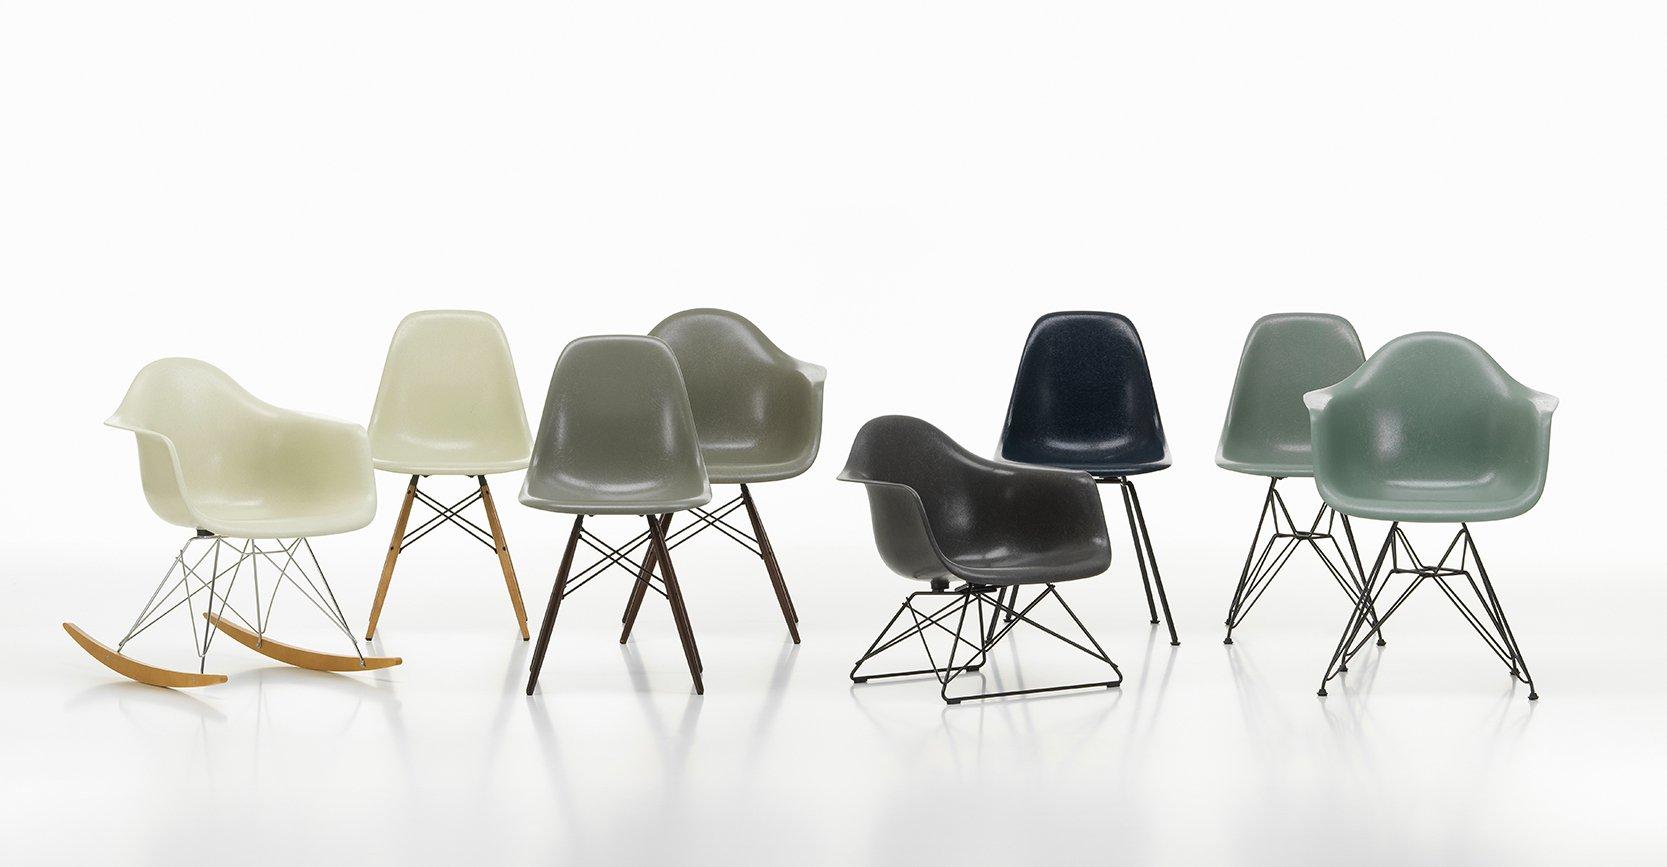 Eames Plastic en Fiber Chair overzicht